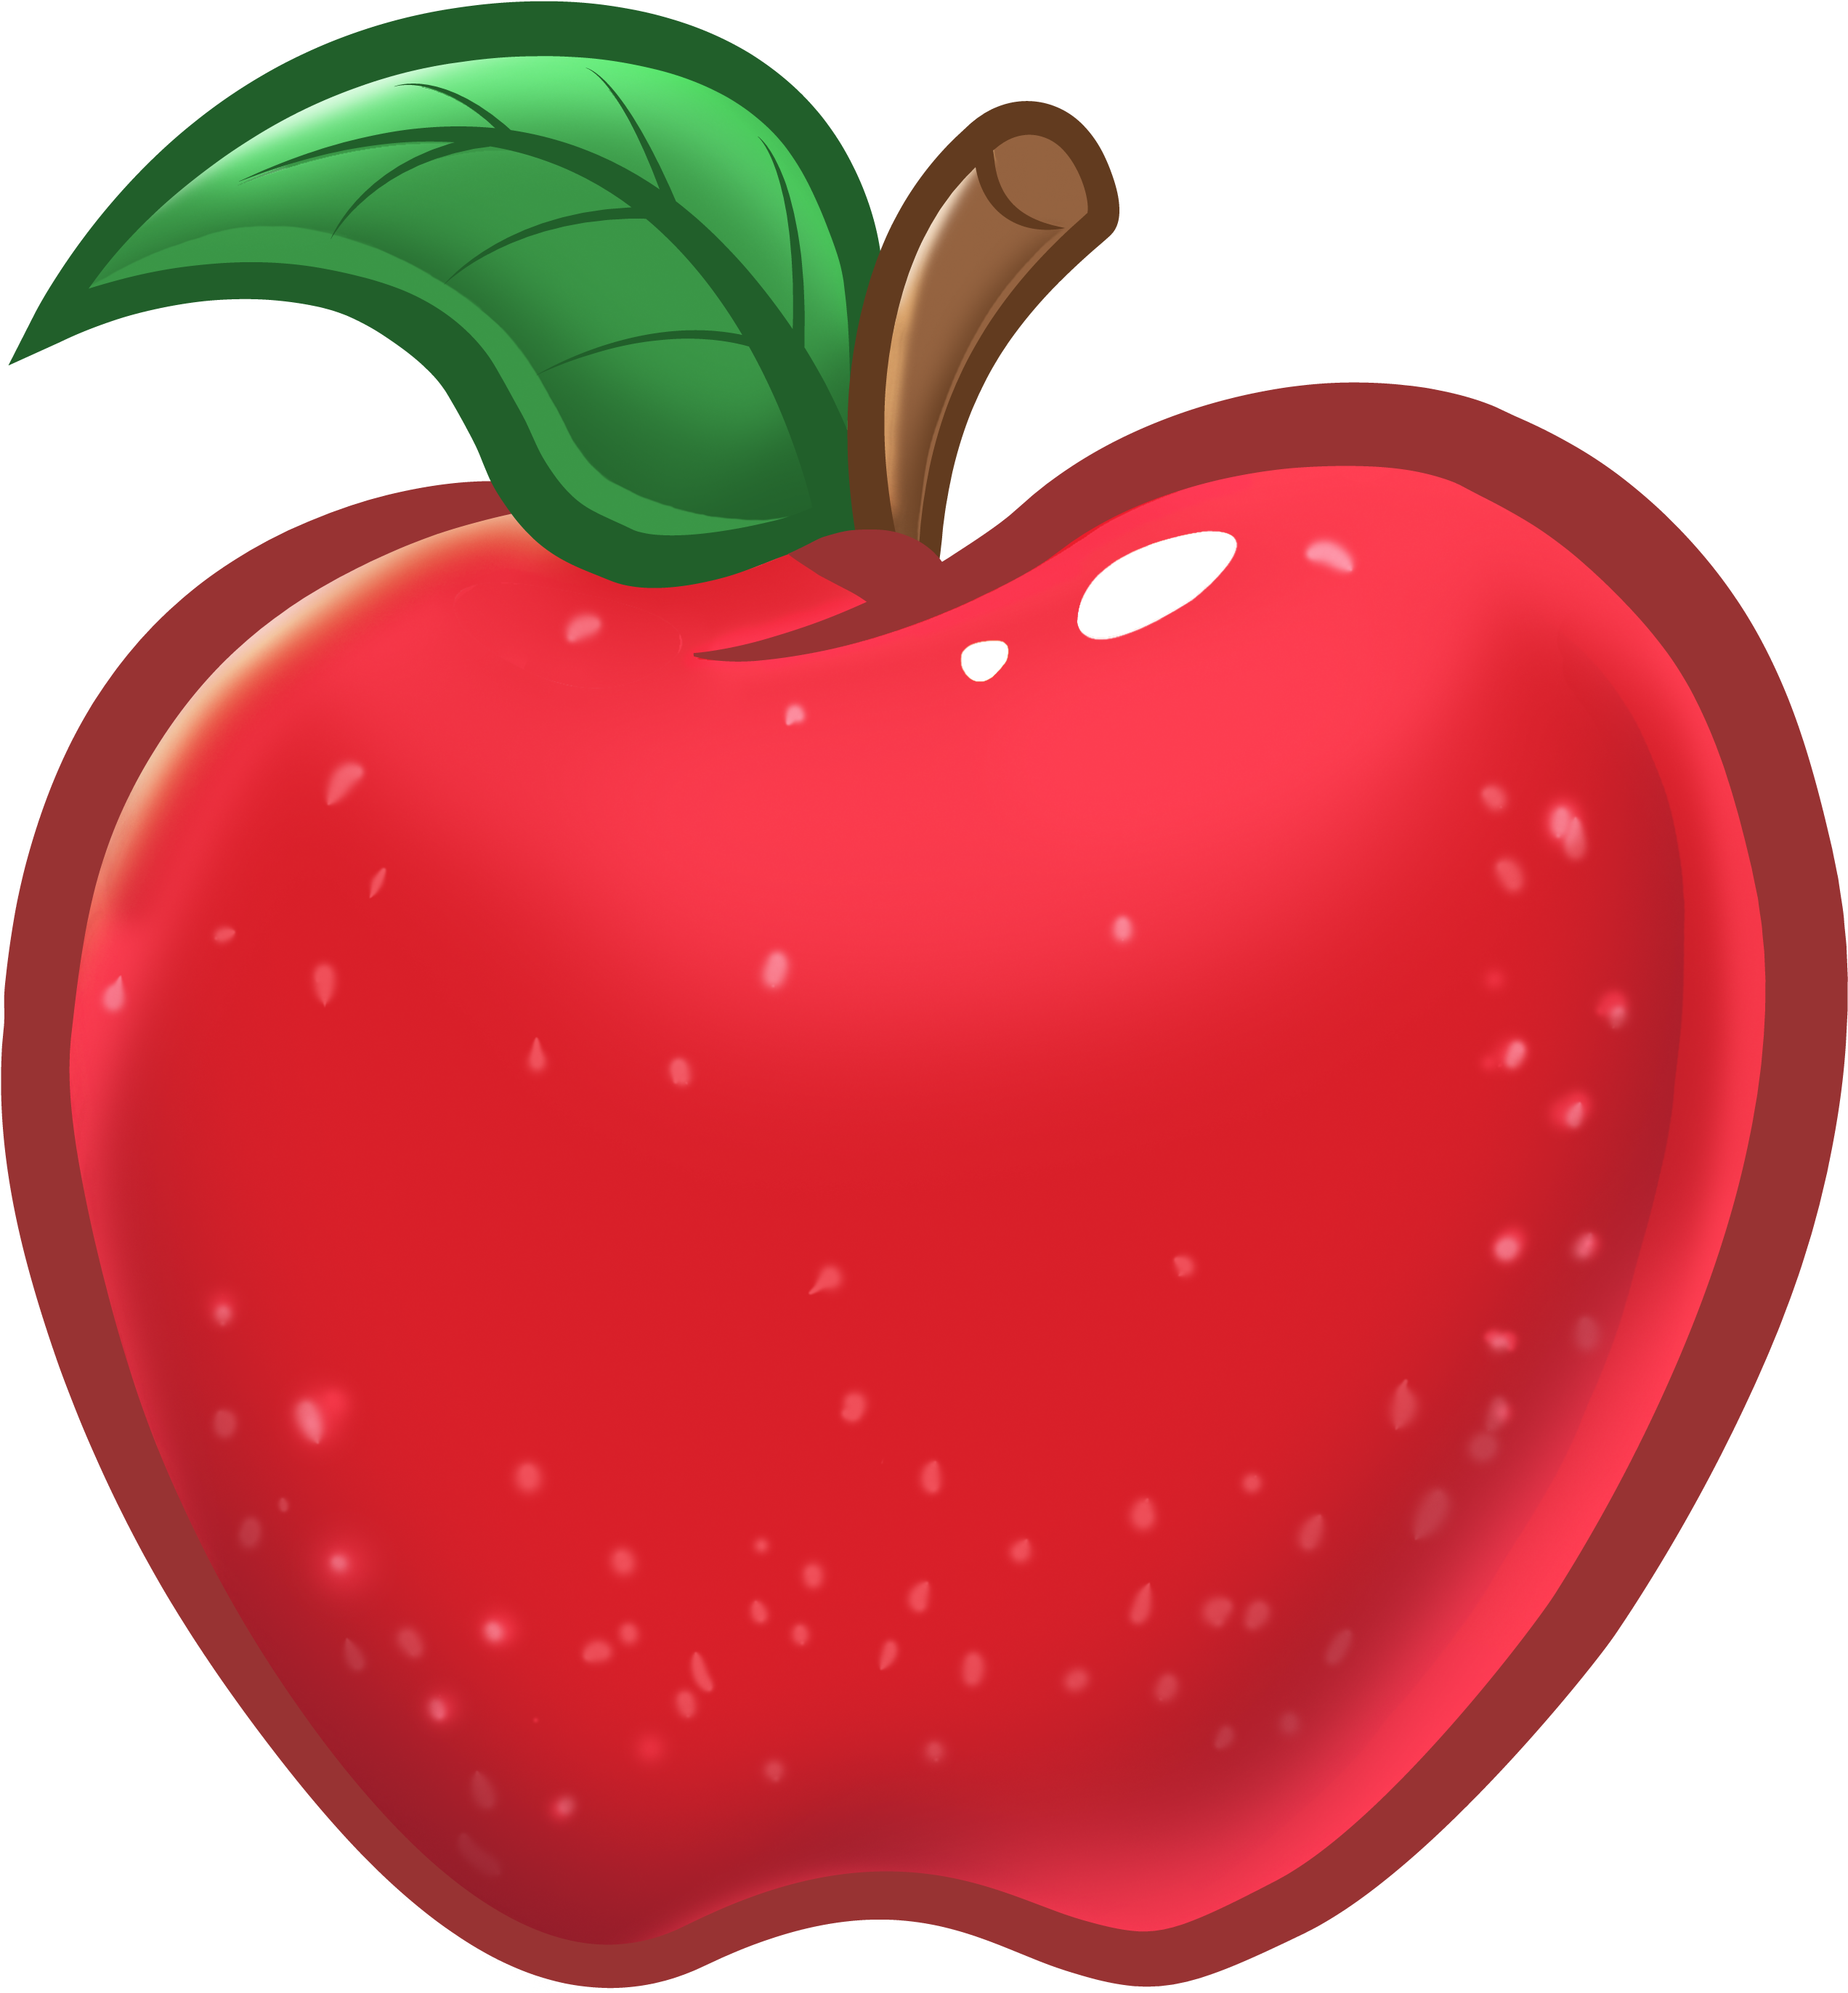 Transparent apples clipart - Teacher Apple Clipart - Teacher Red Apple Clipart